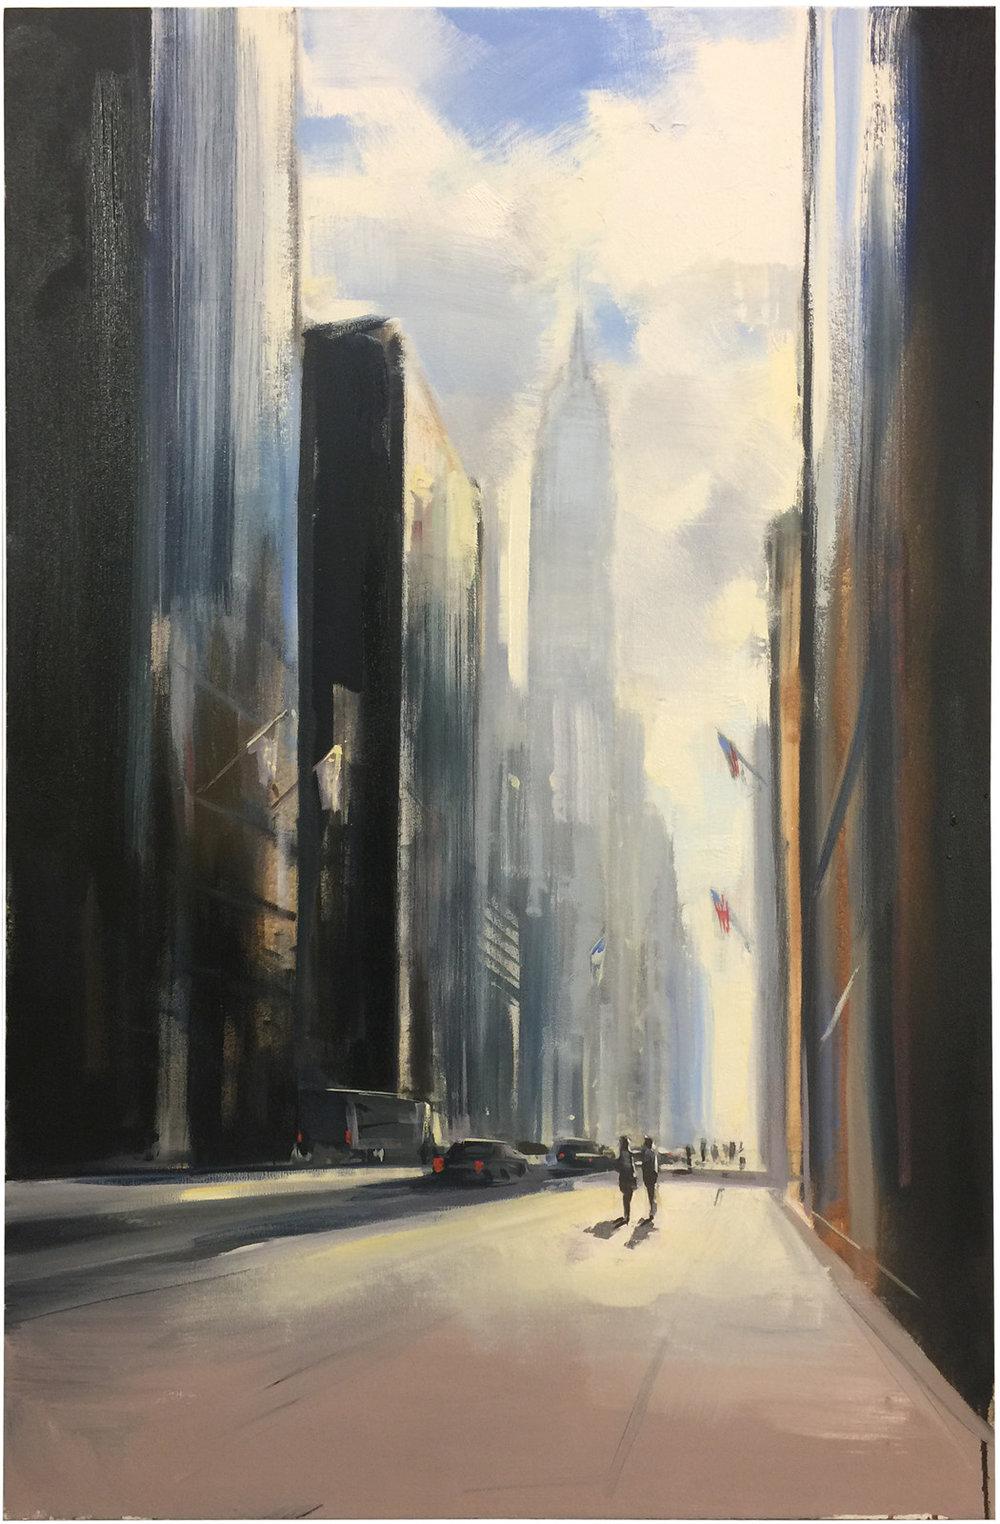 City Shadows, 52 x 34